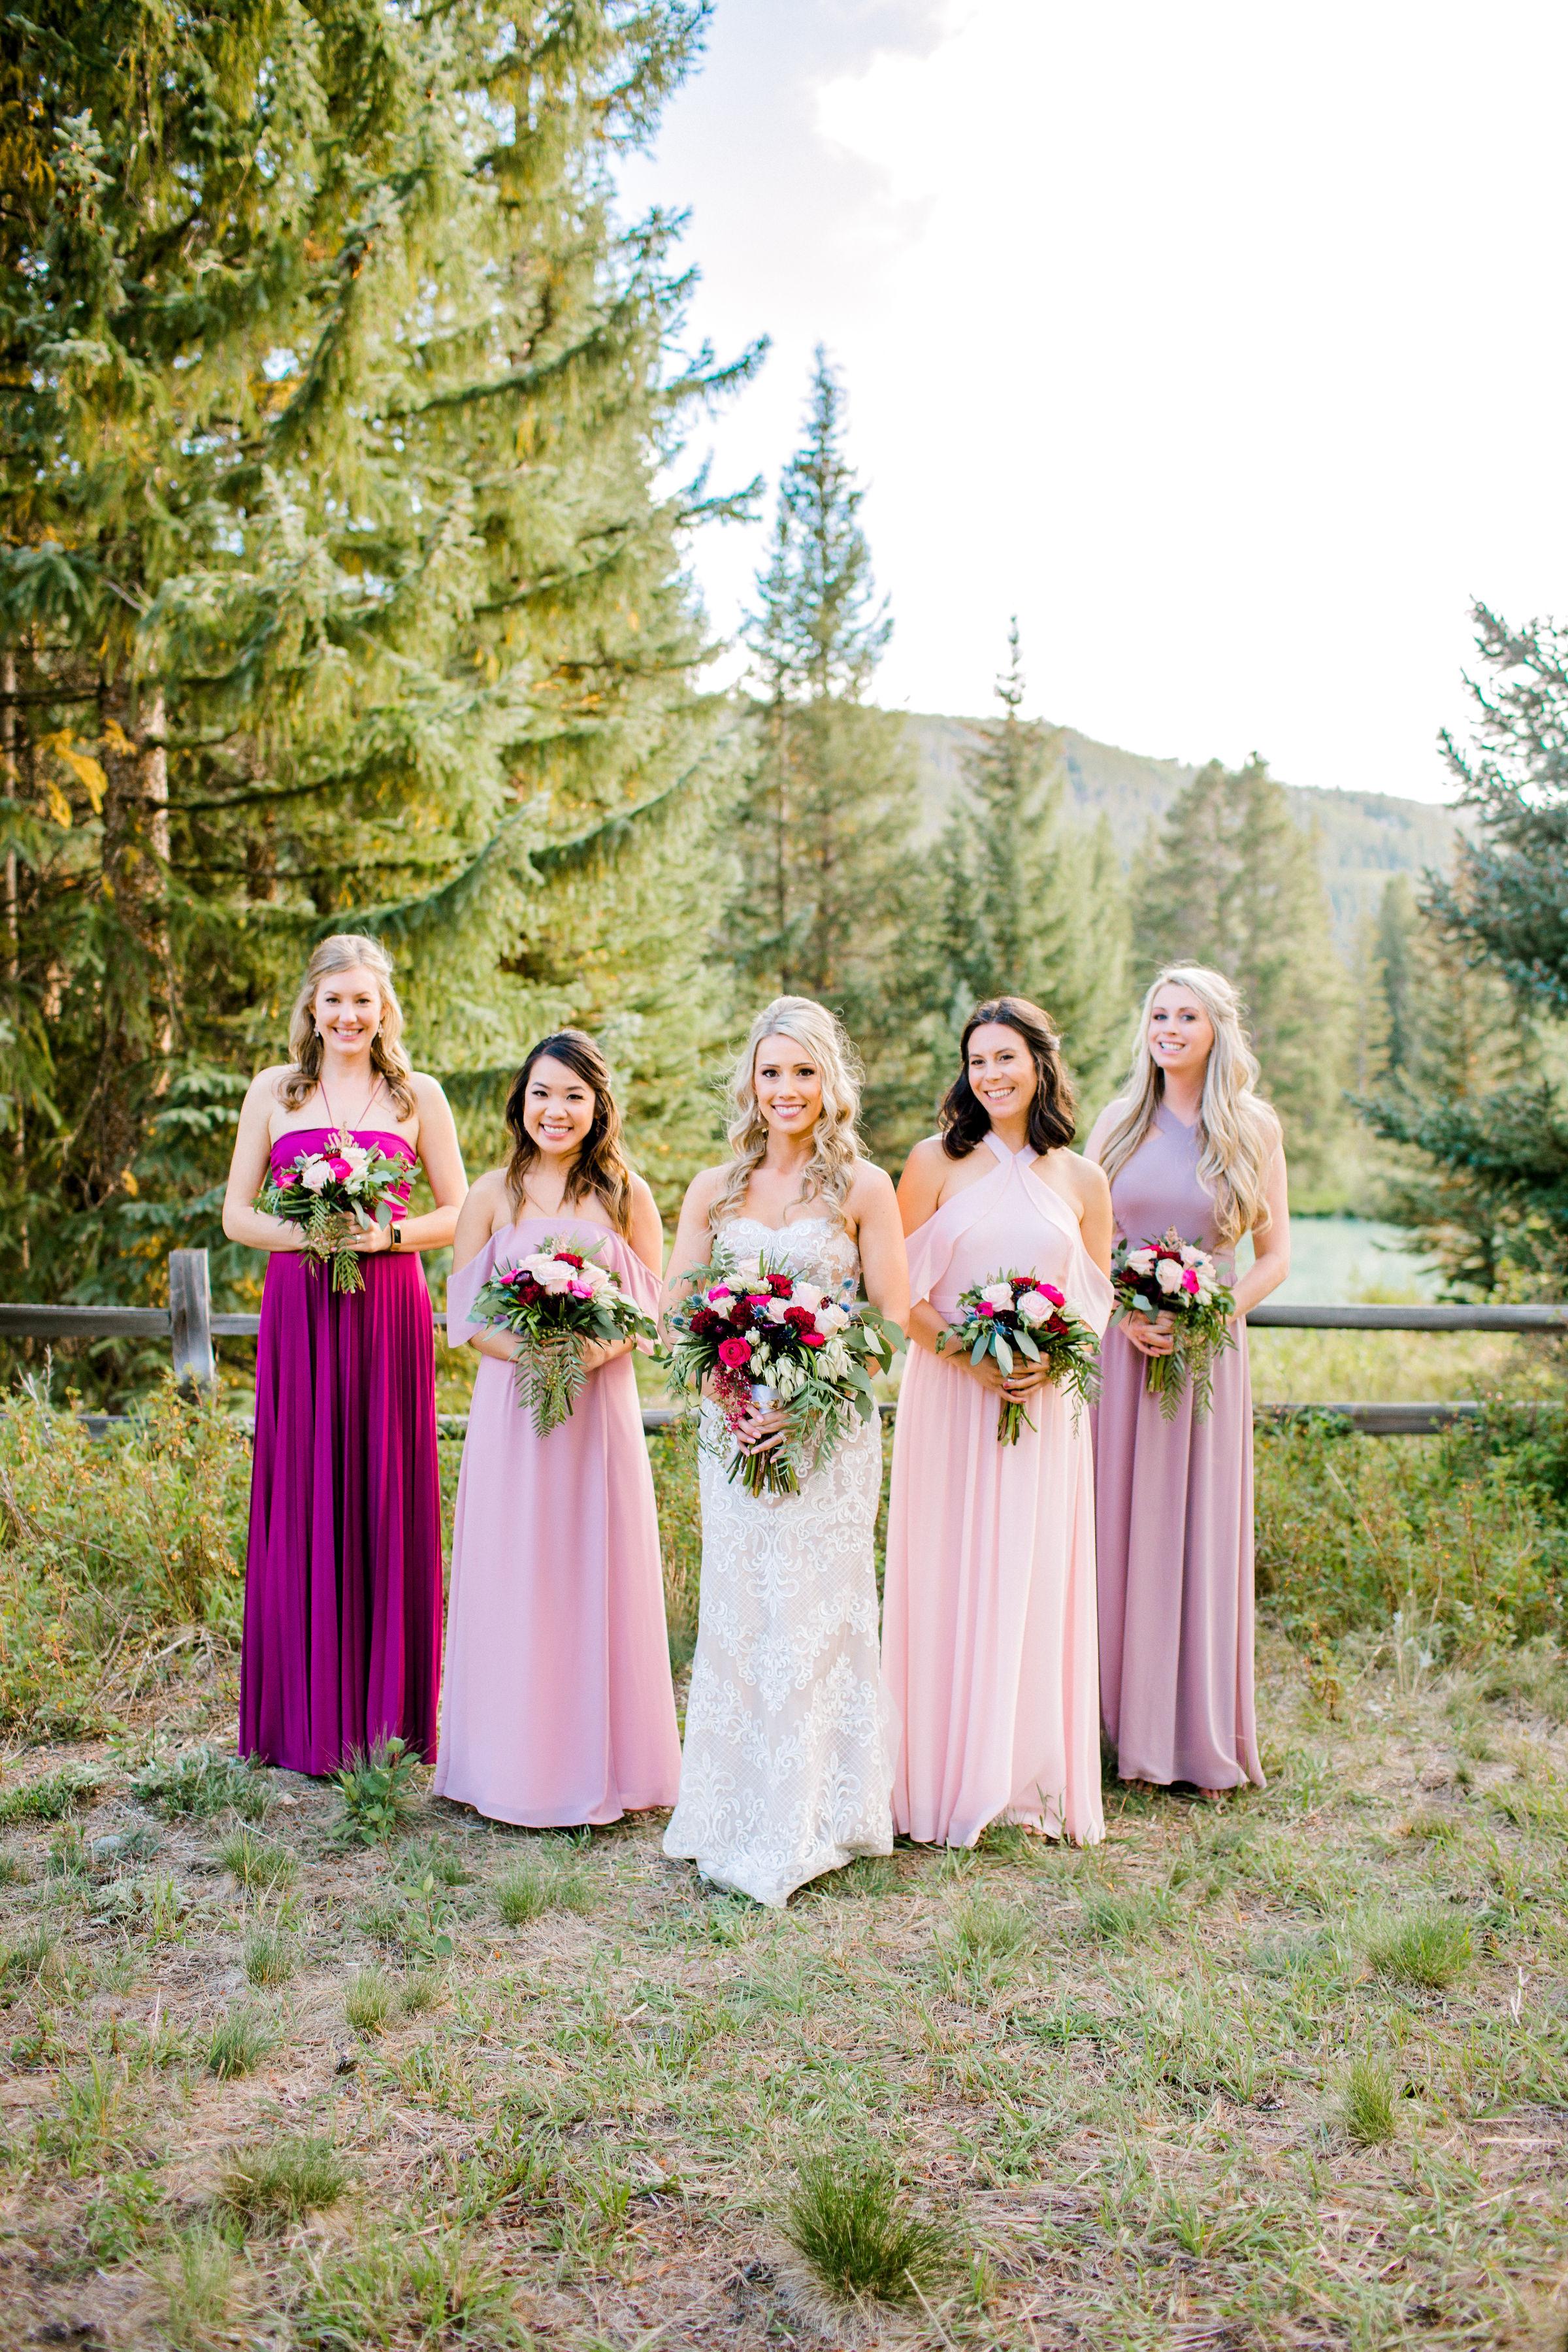 Bridal Party for Mountain Wedding